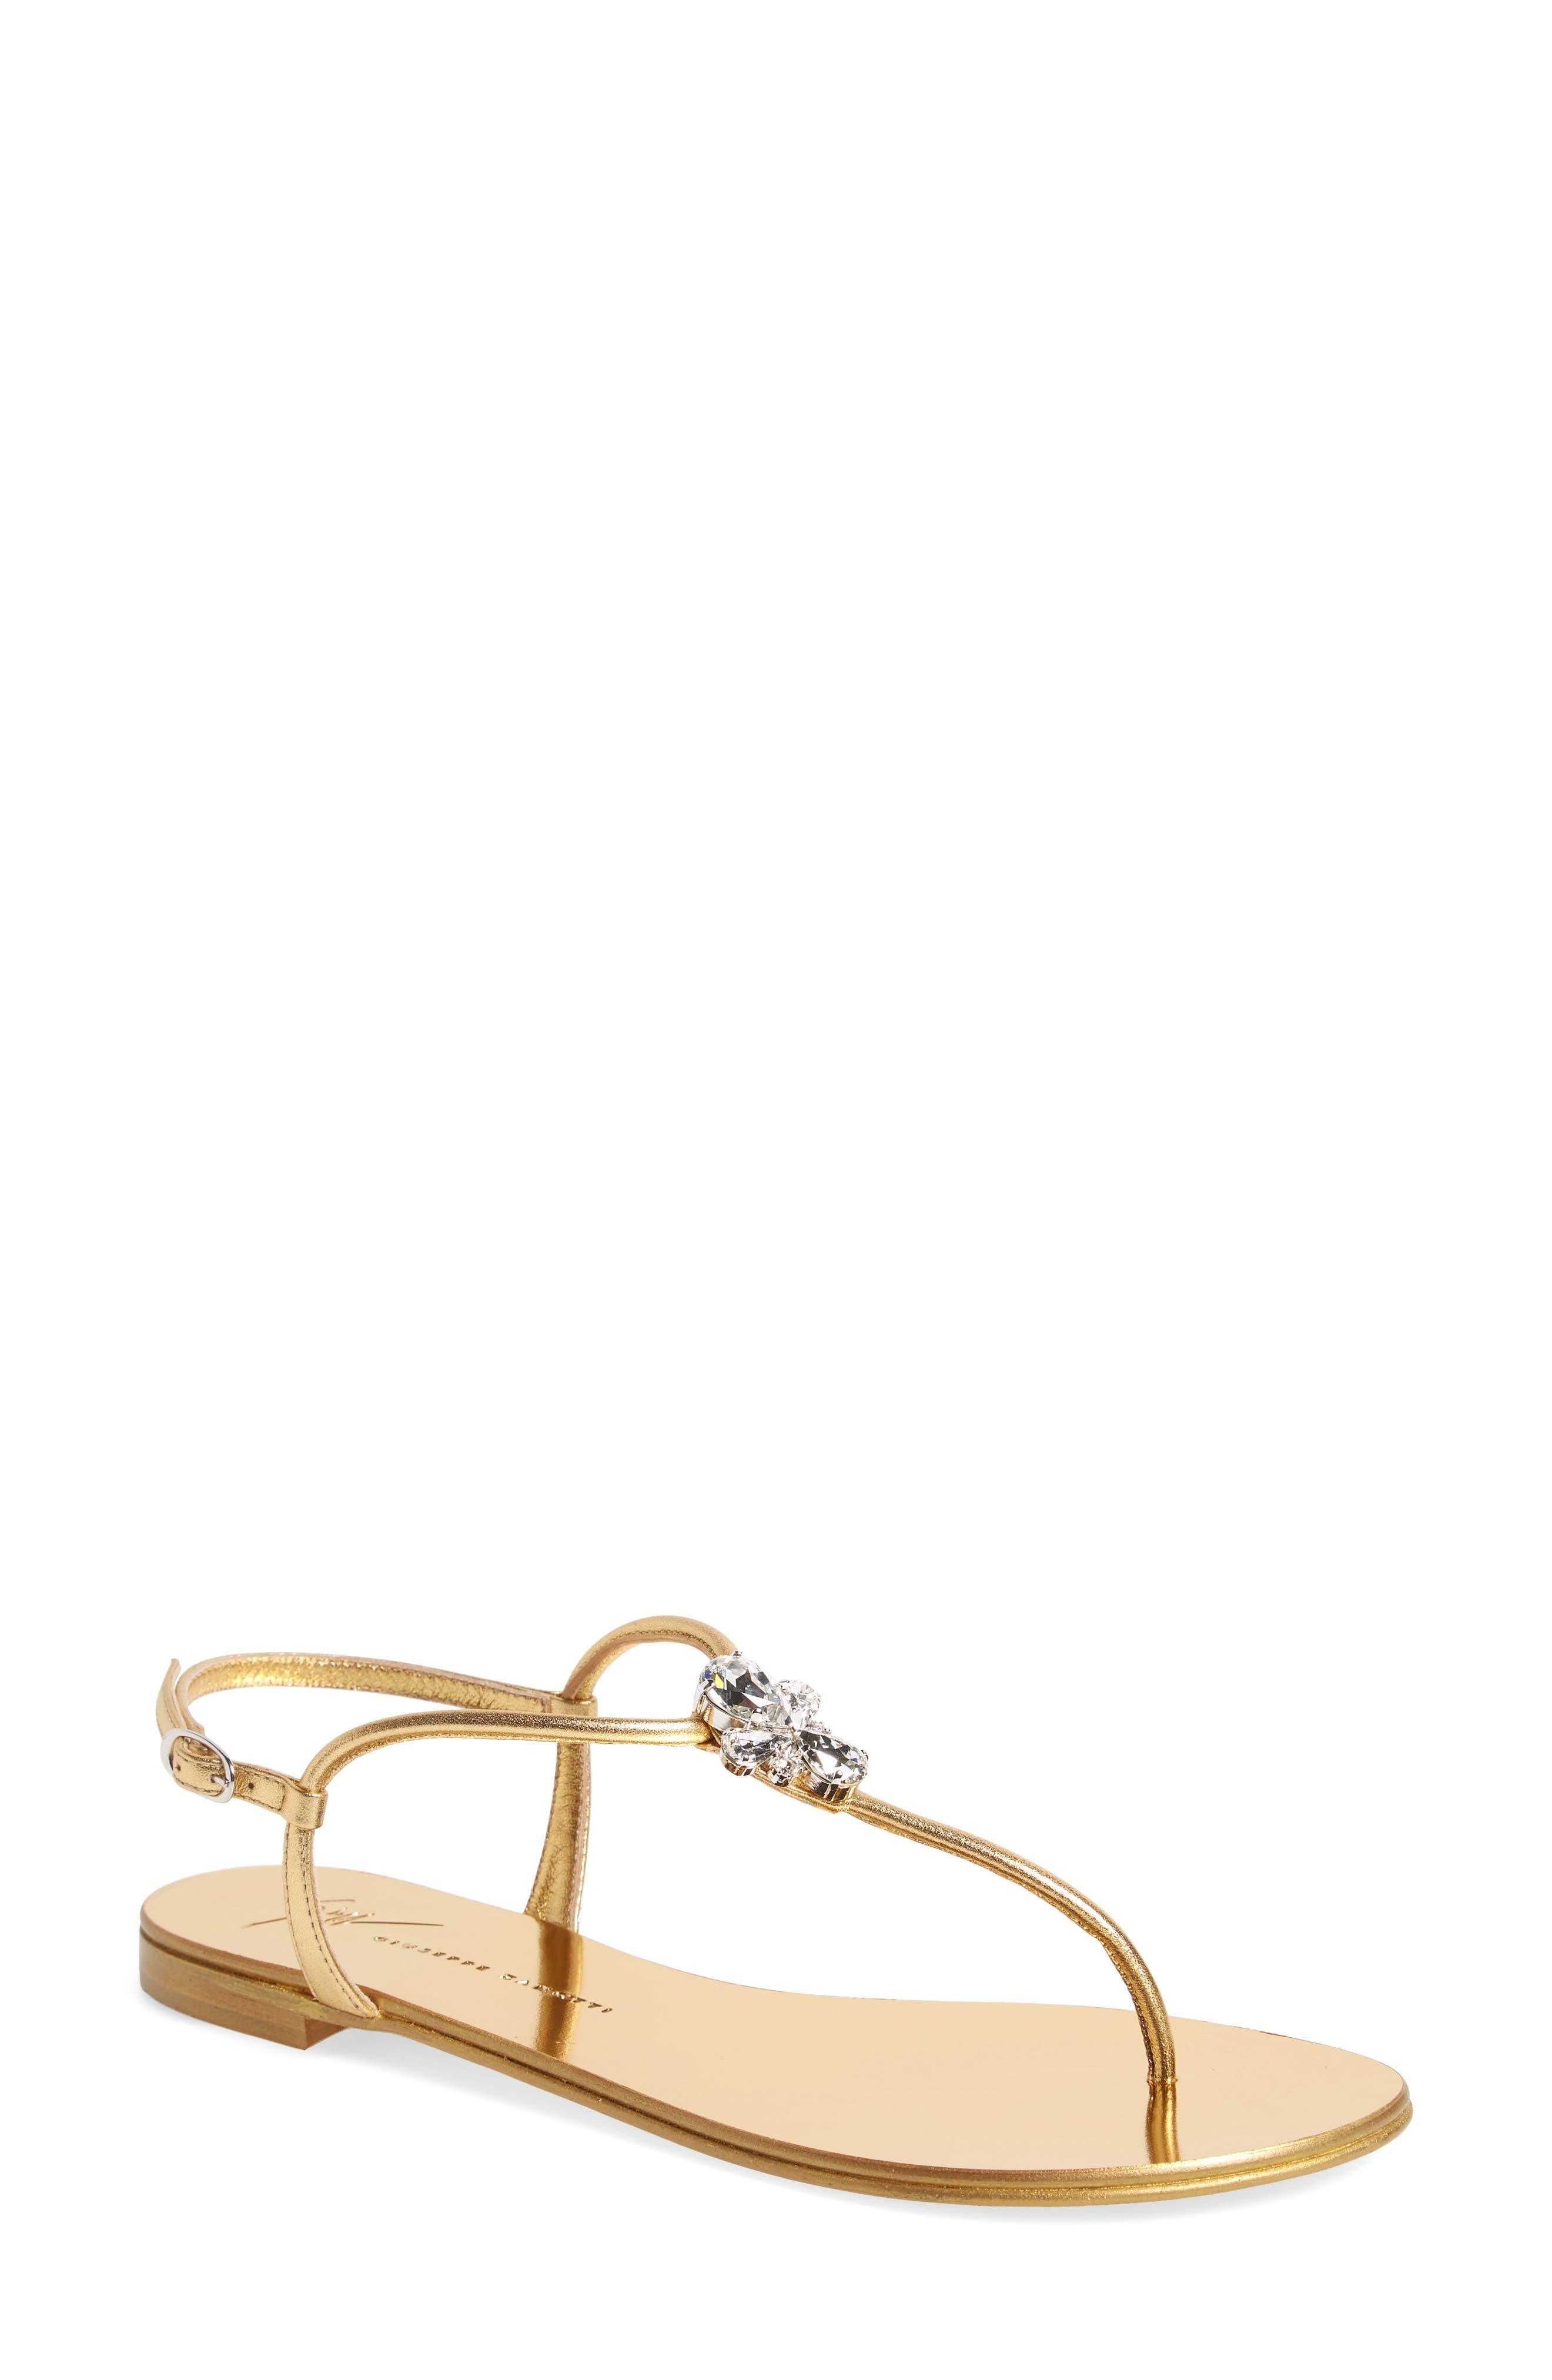 Crystal T-Strap Sandal,                             Main thumbnail 1, color,                             Gold